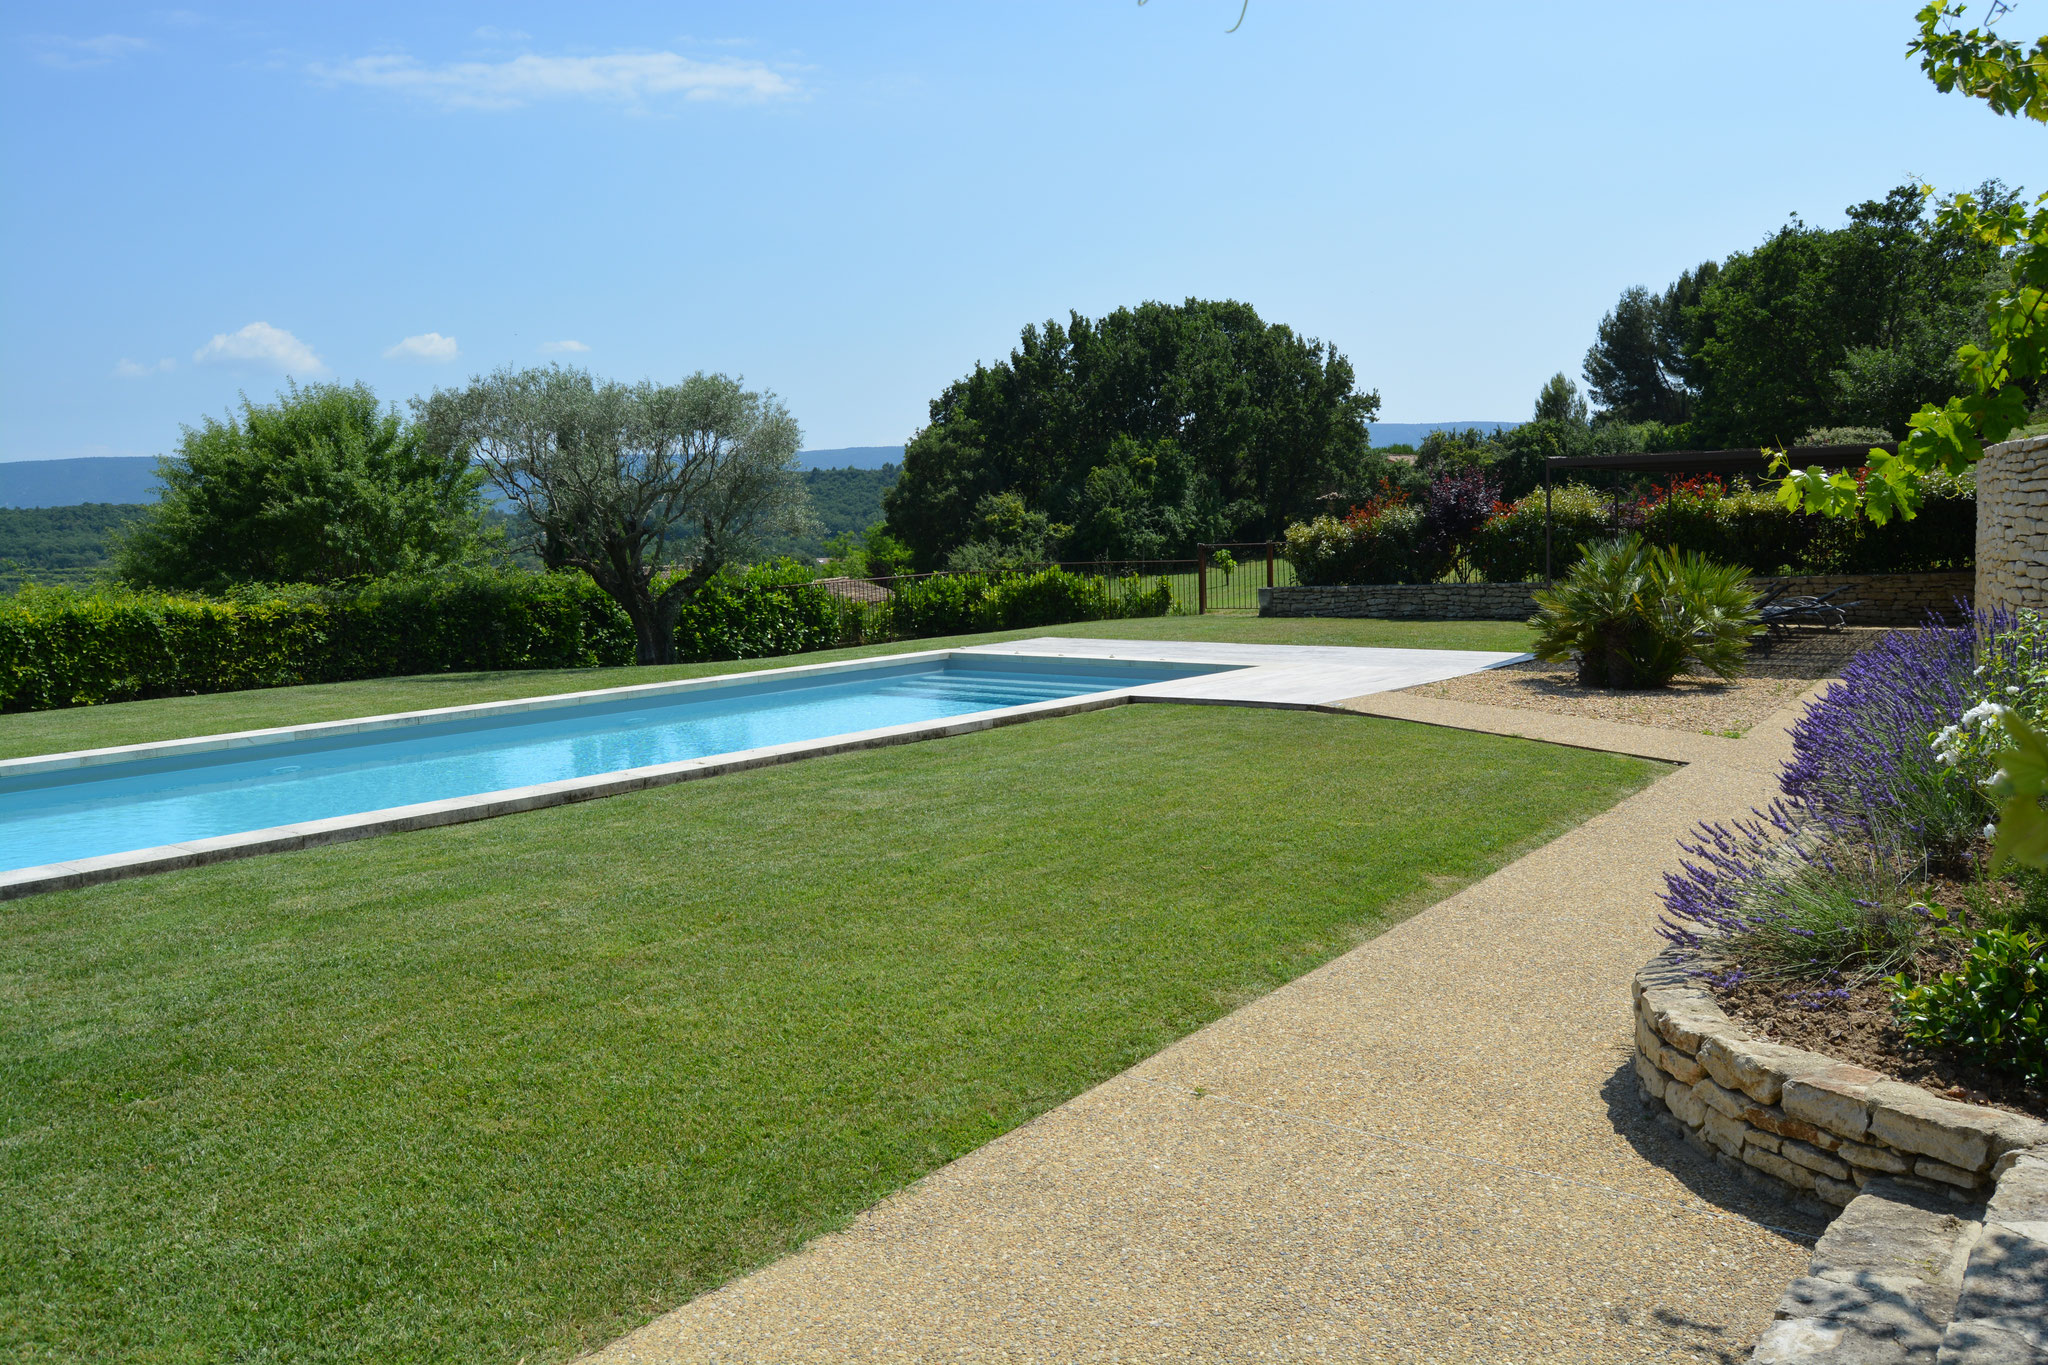 Location maison vacances luberon piscine ventana blog - Location maison avec piscine luberon ...